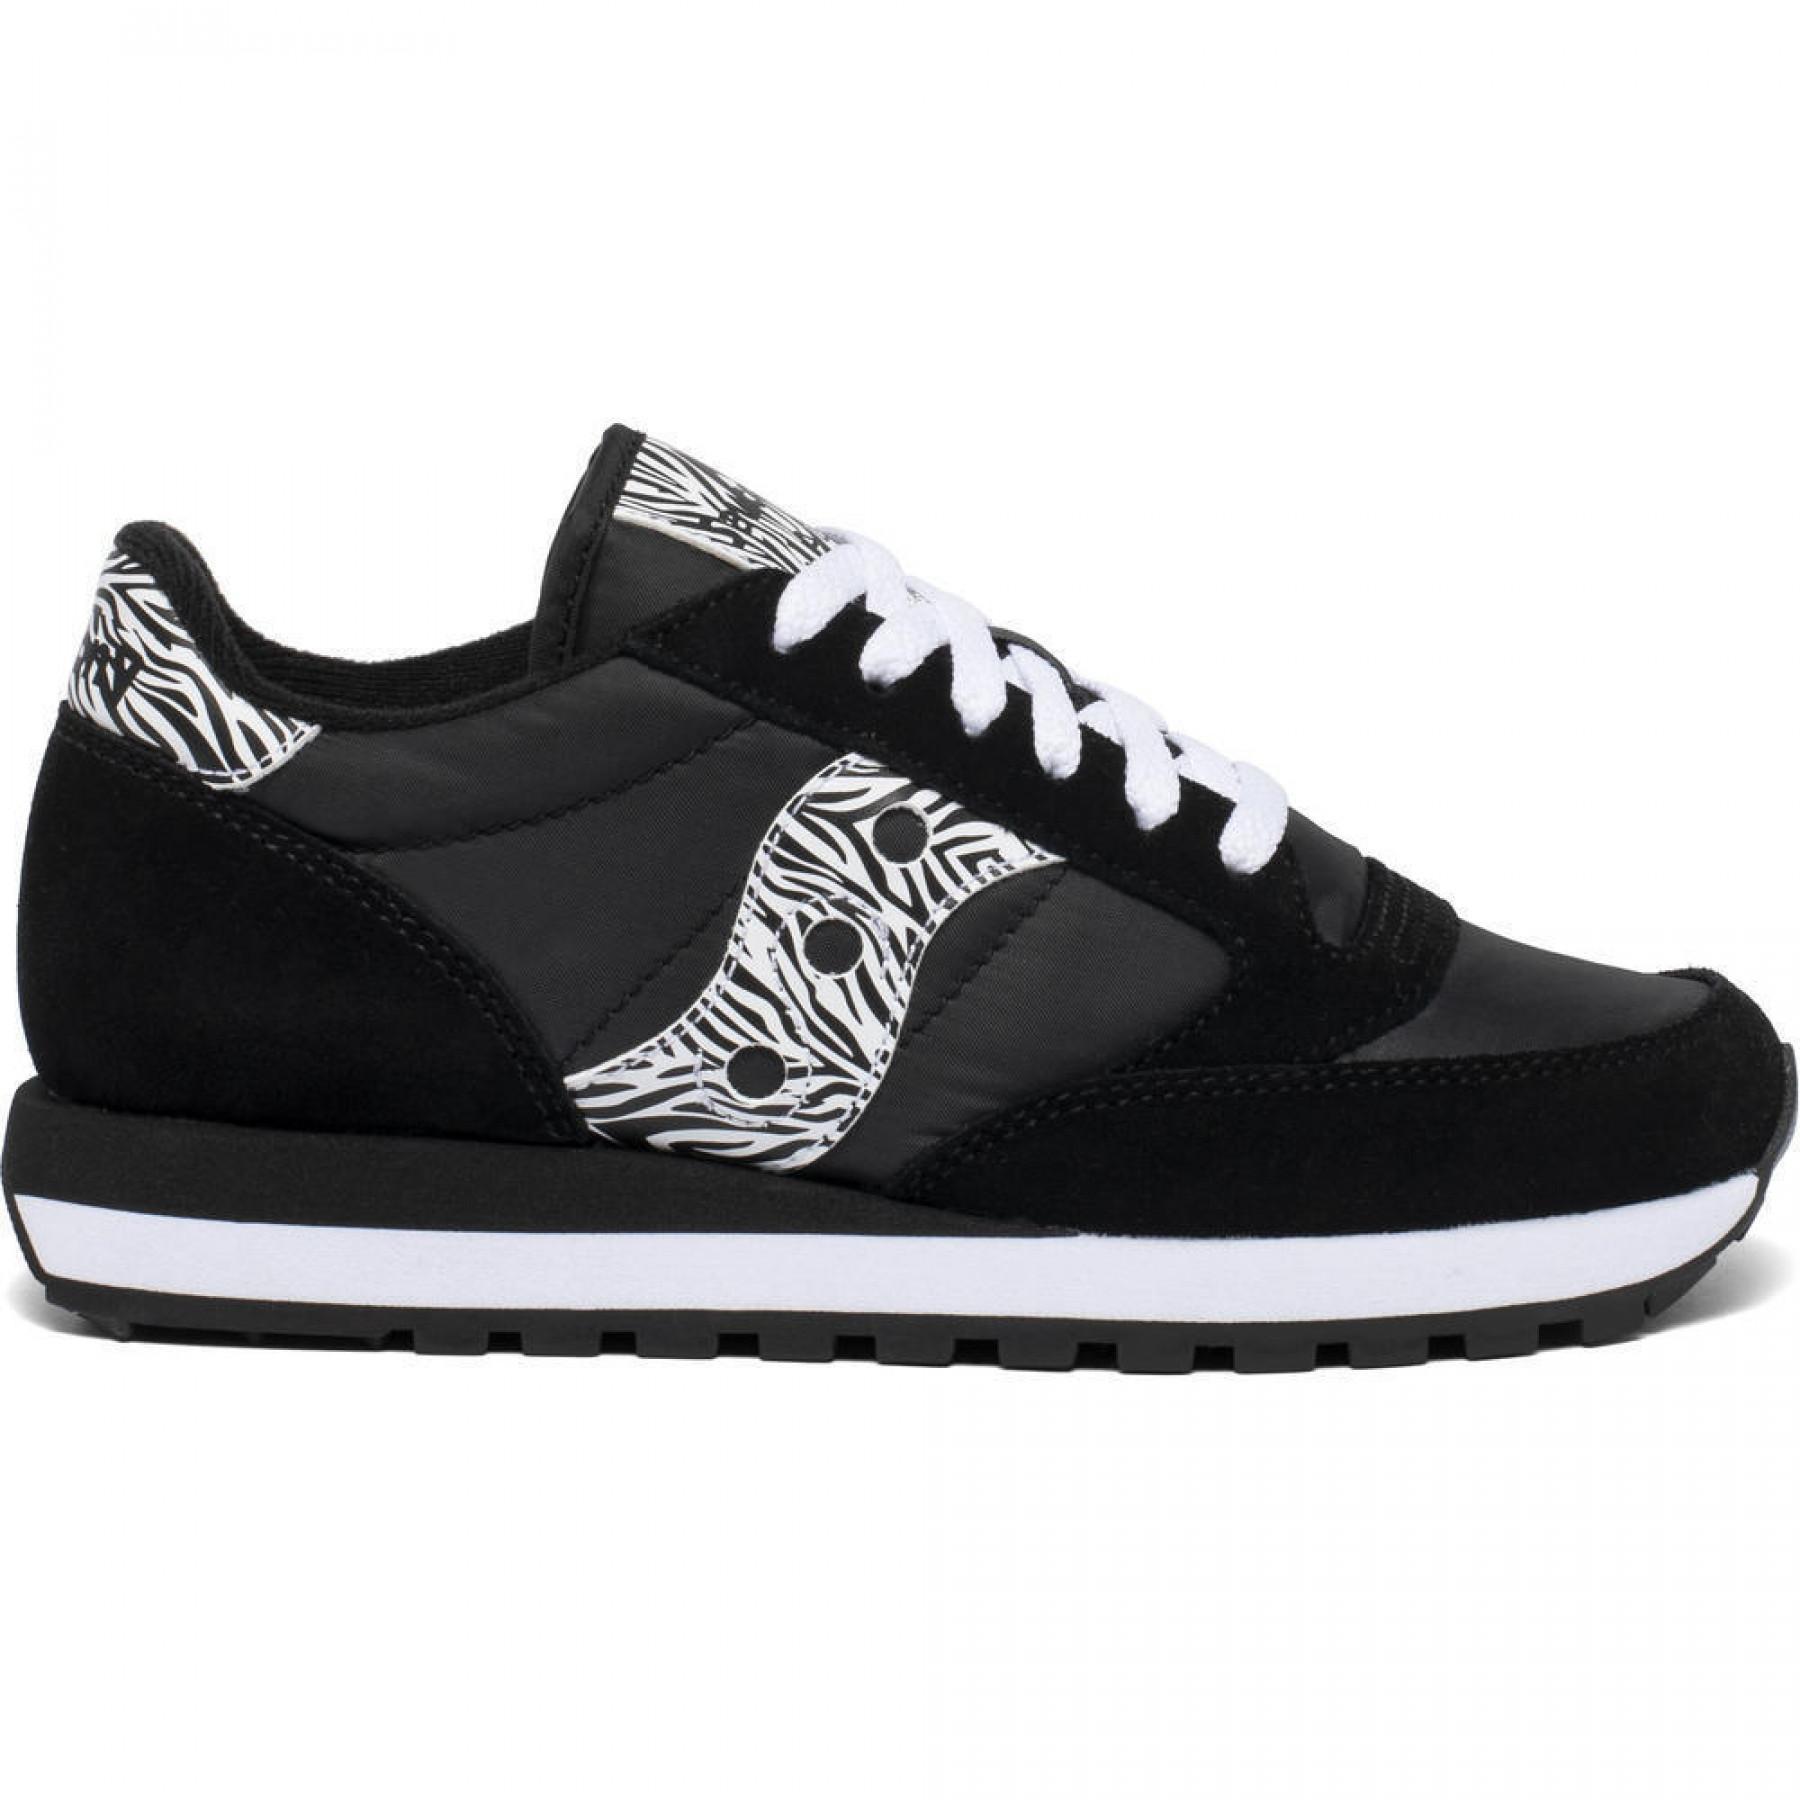 Saucony jazz original women's shoes